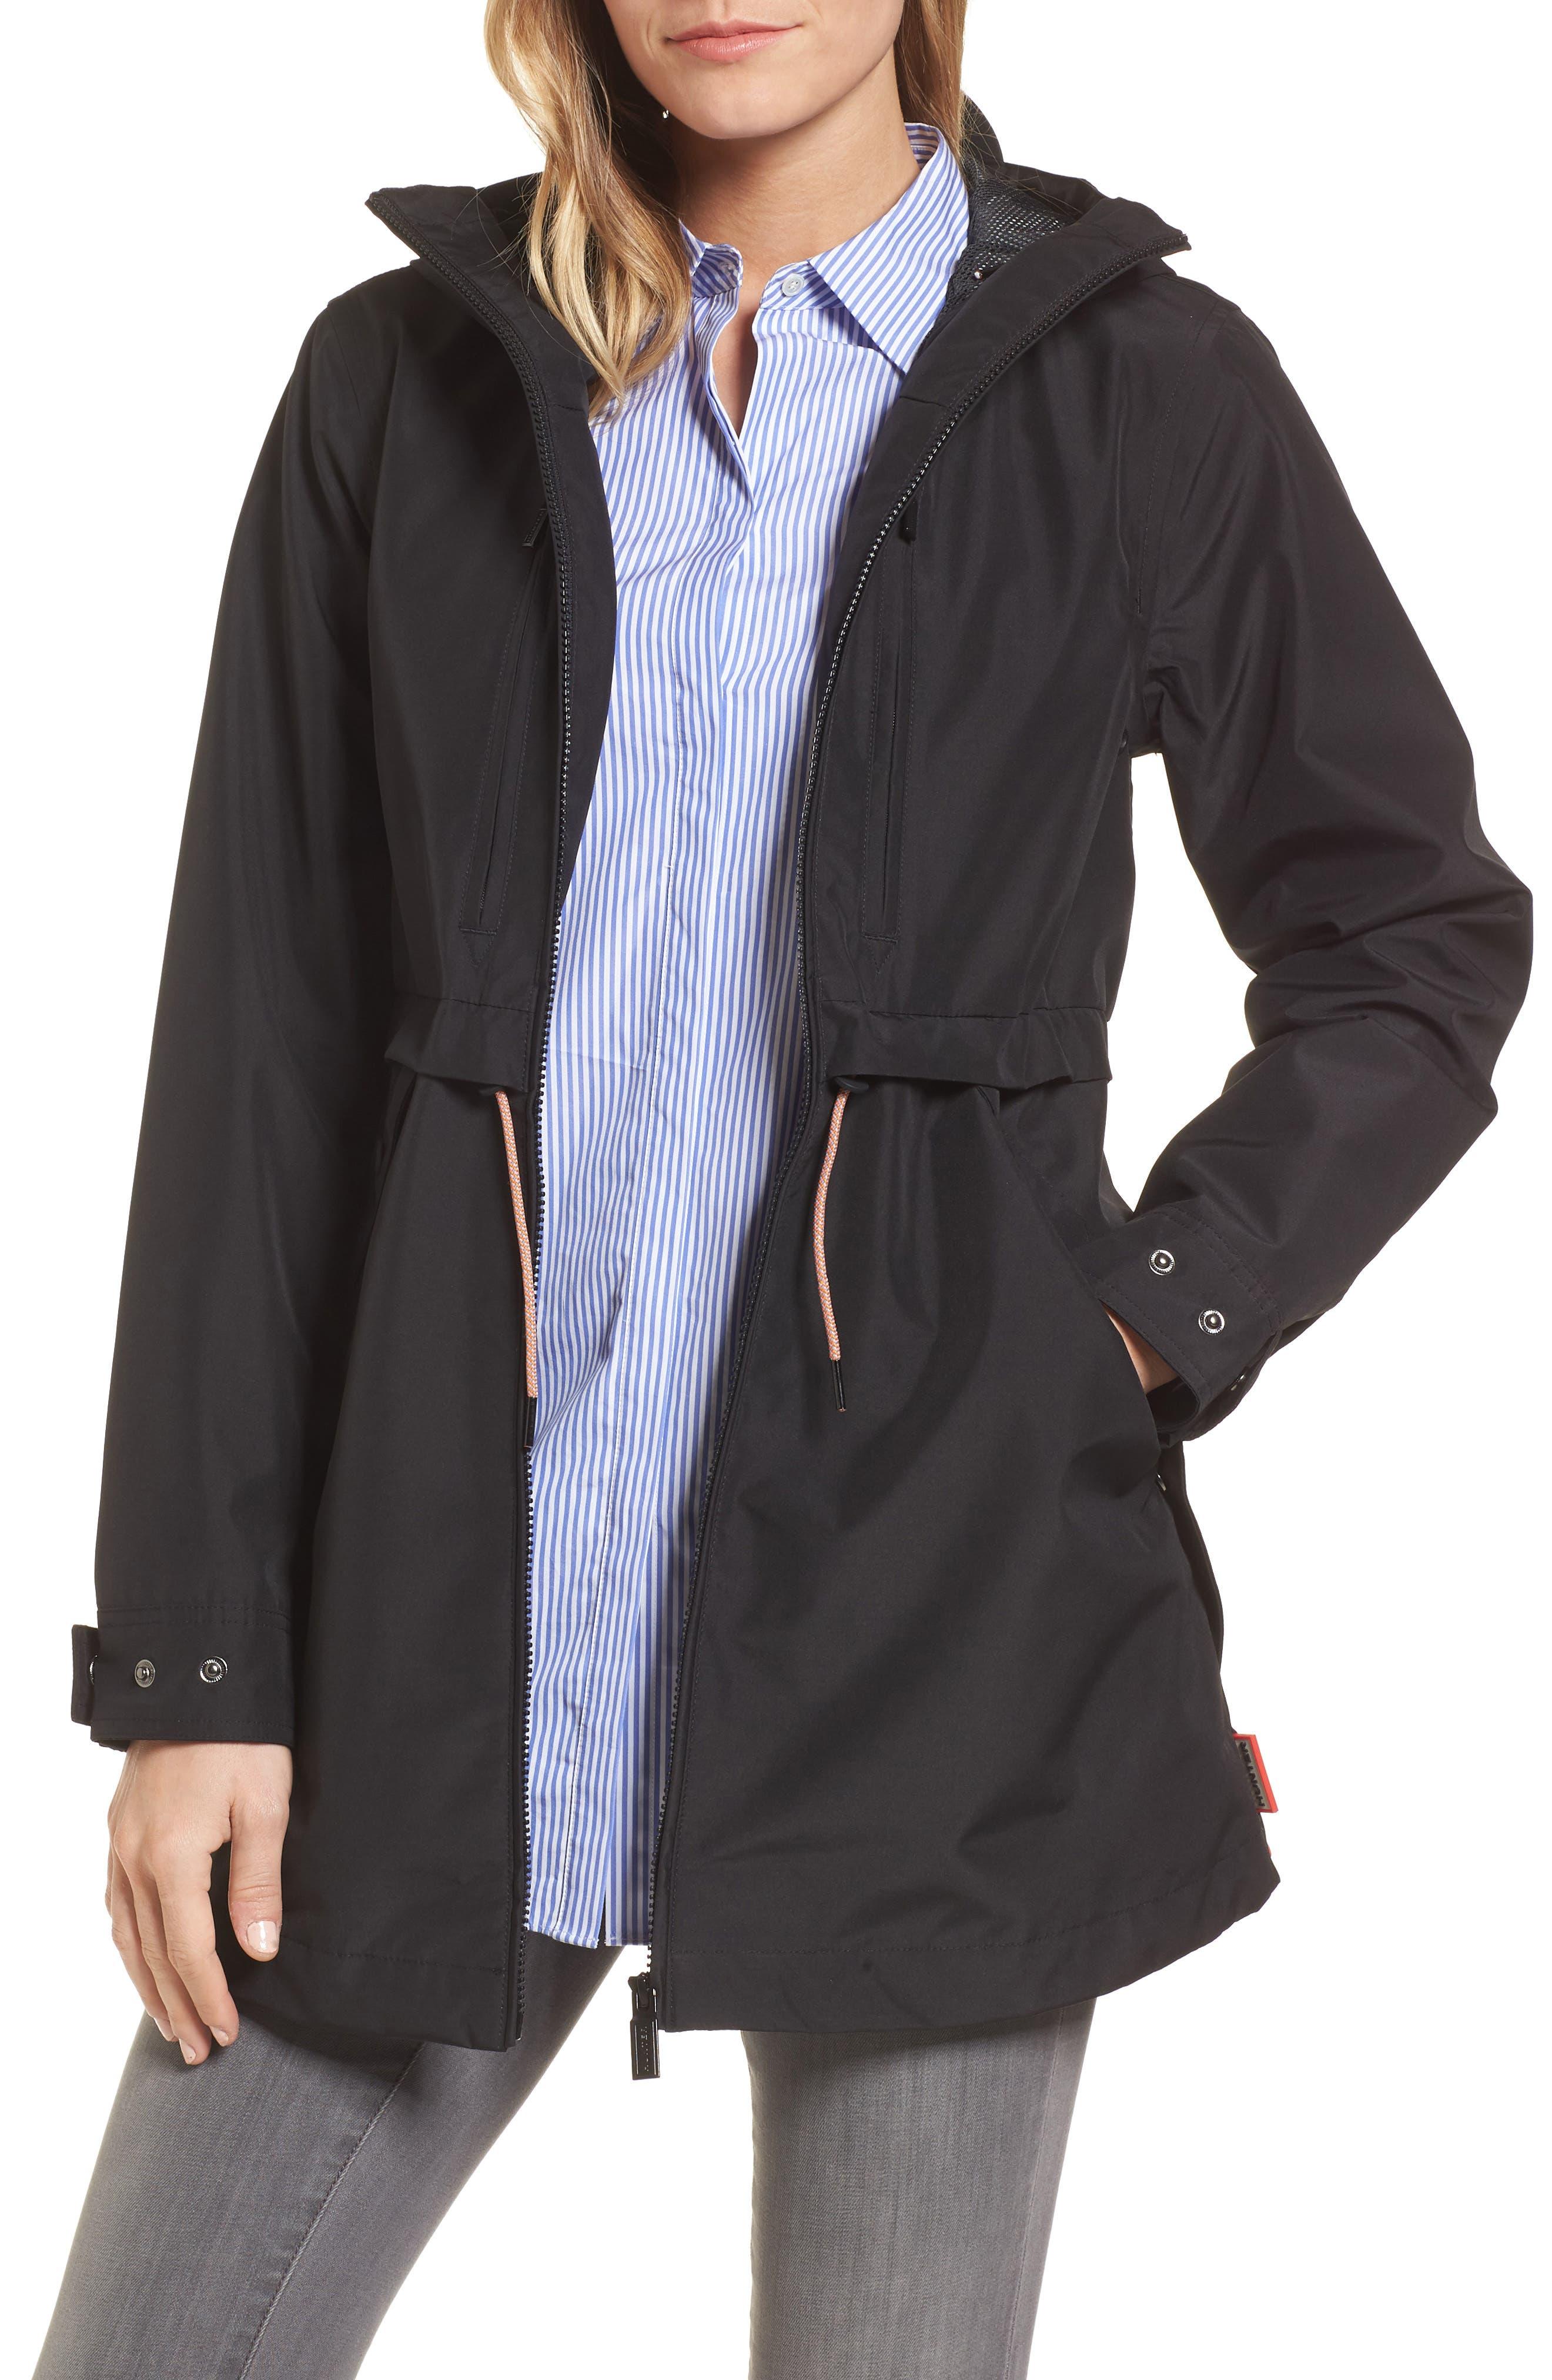 Alternate Image 1 Selected - Hunter Original 3-Layer Waterproof Anorak Jacket